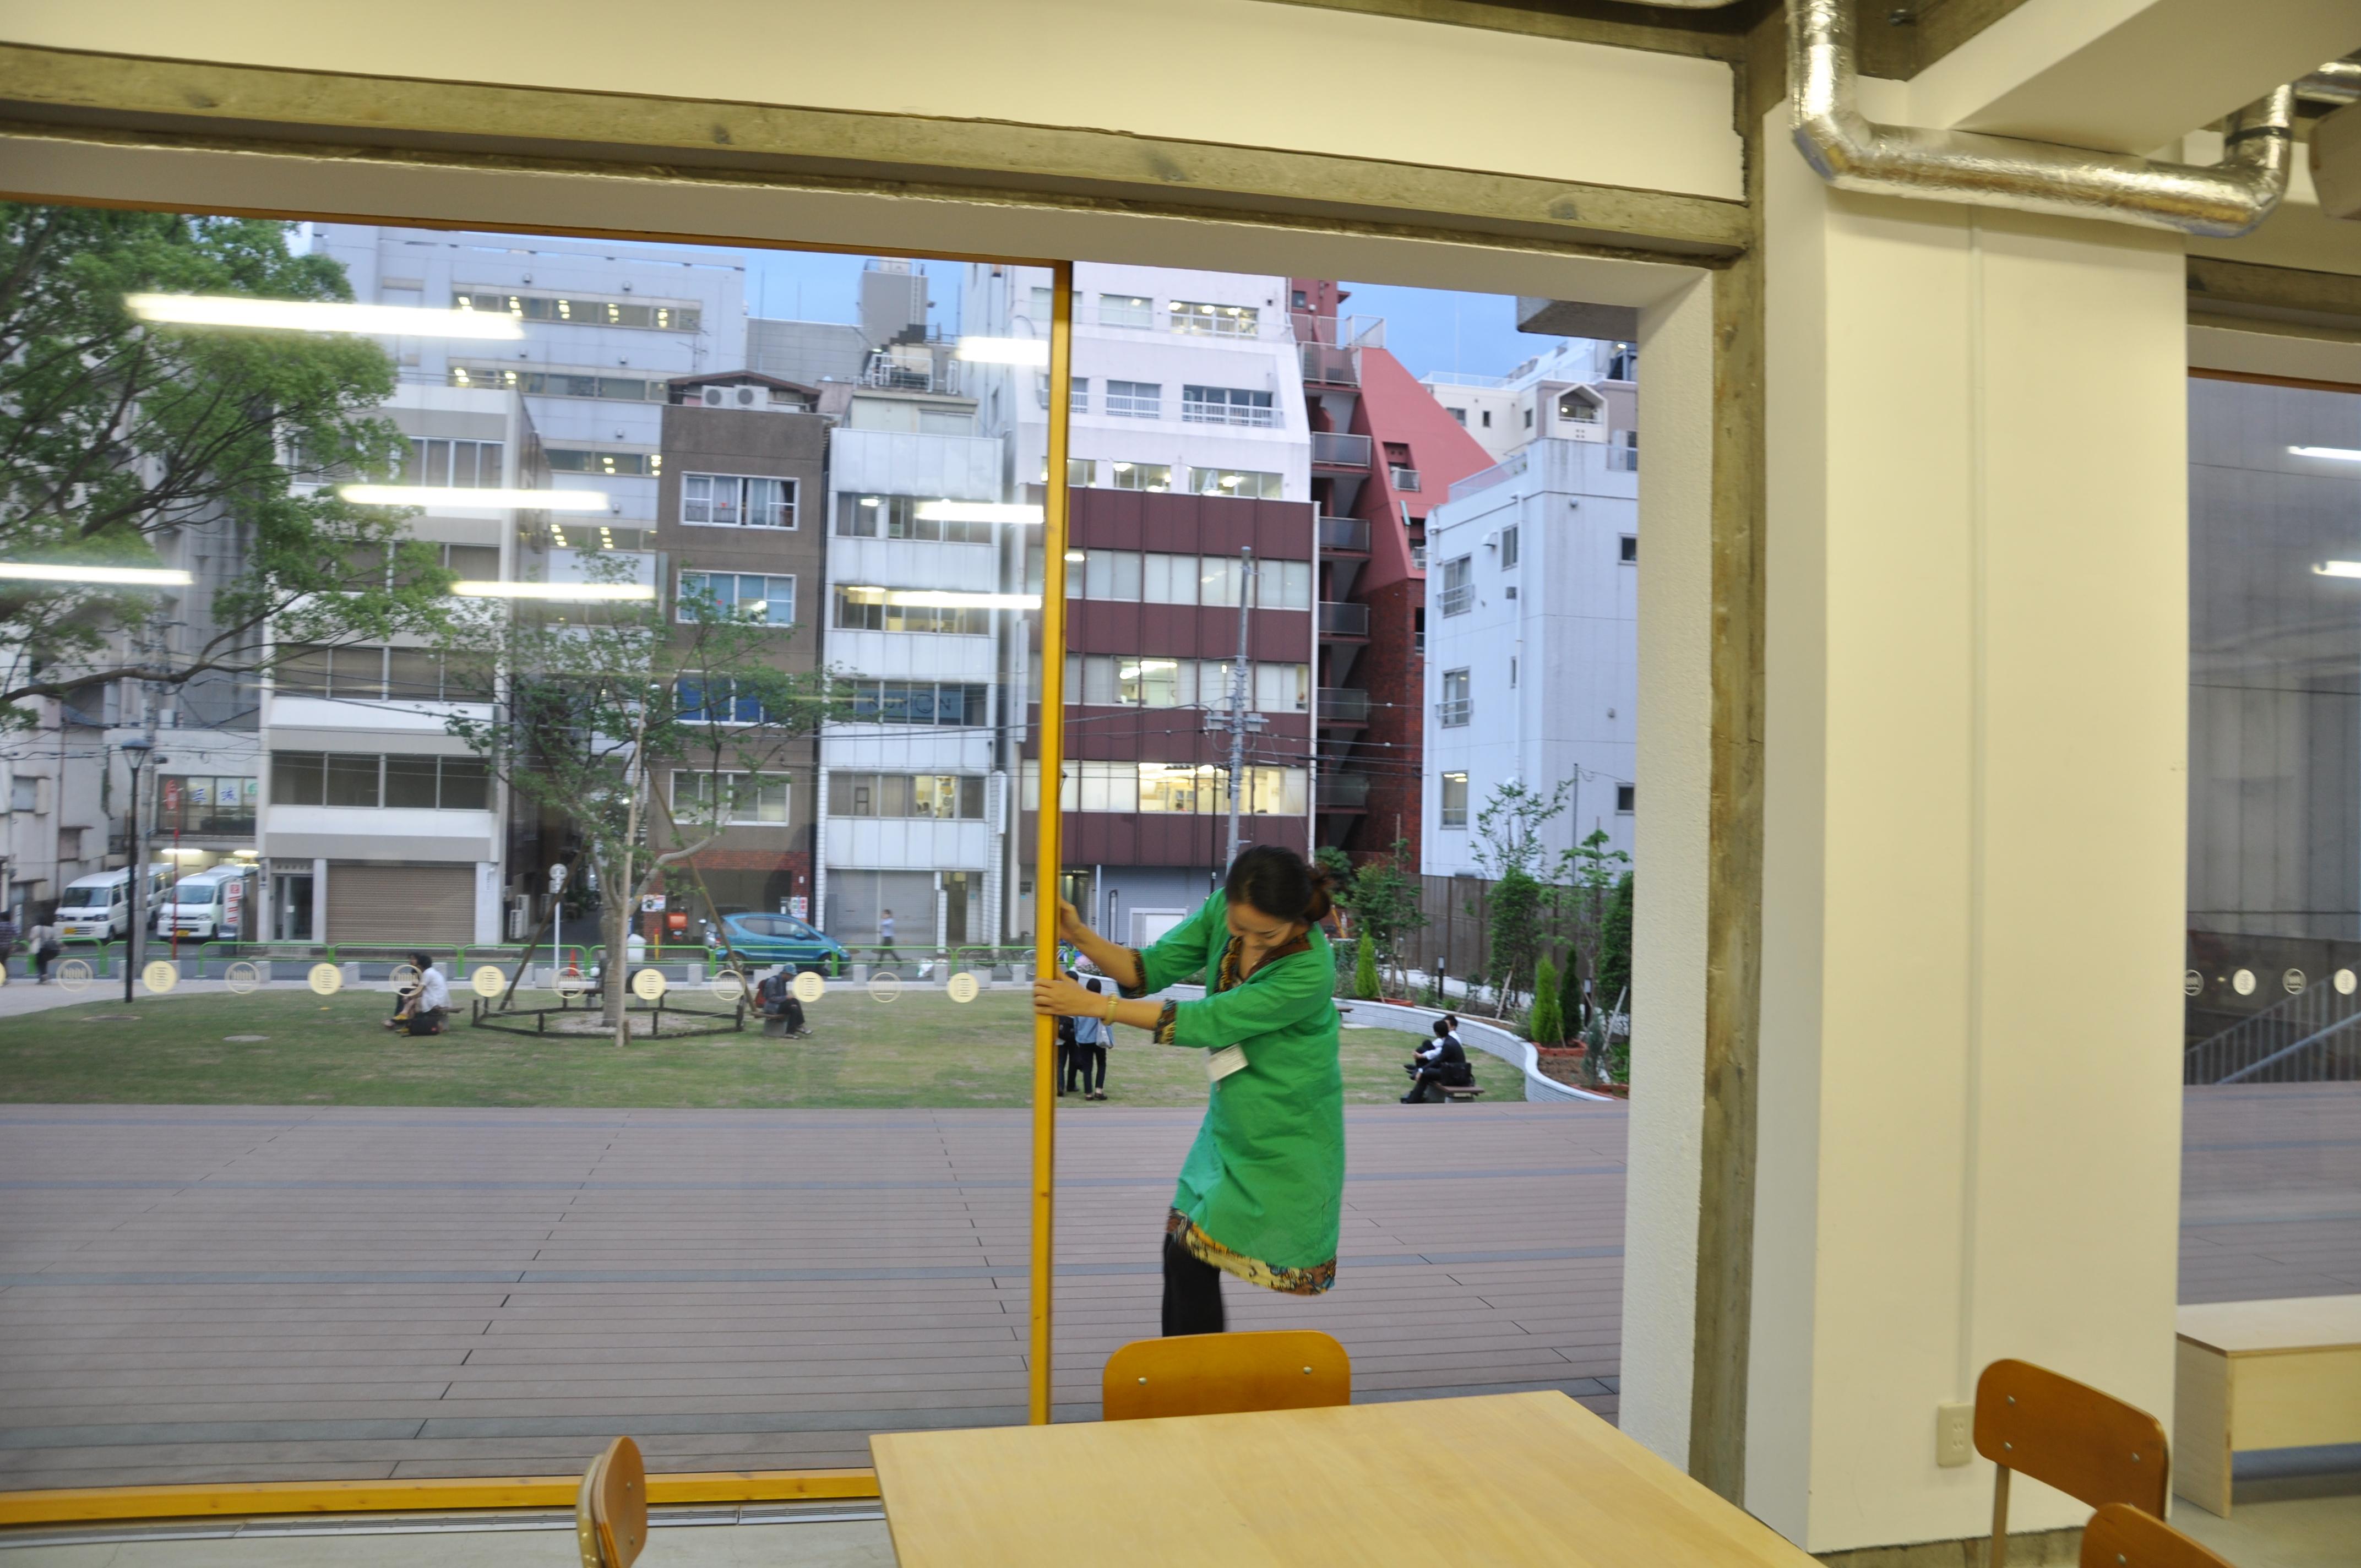 http://blog.3331.jp/staff/file/DSC_2489.JPG